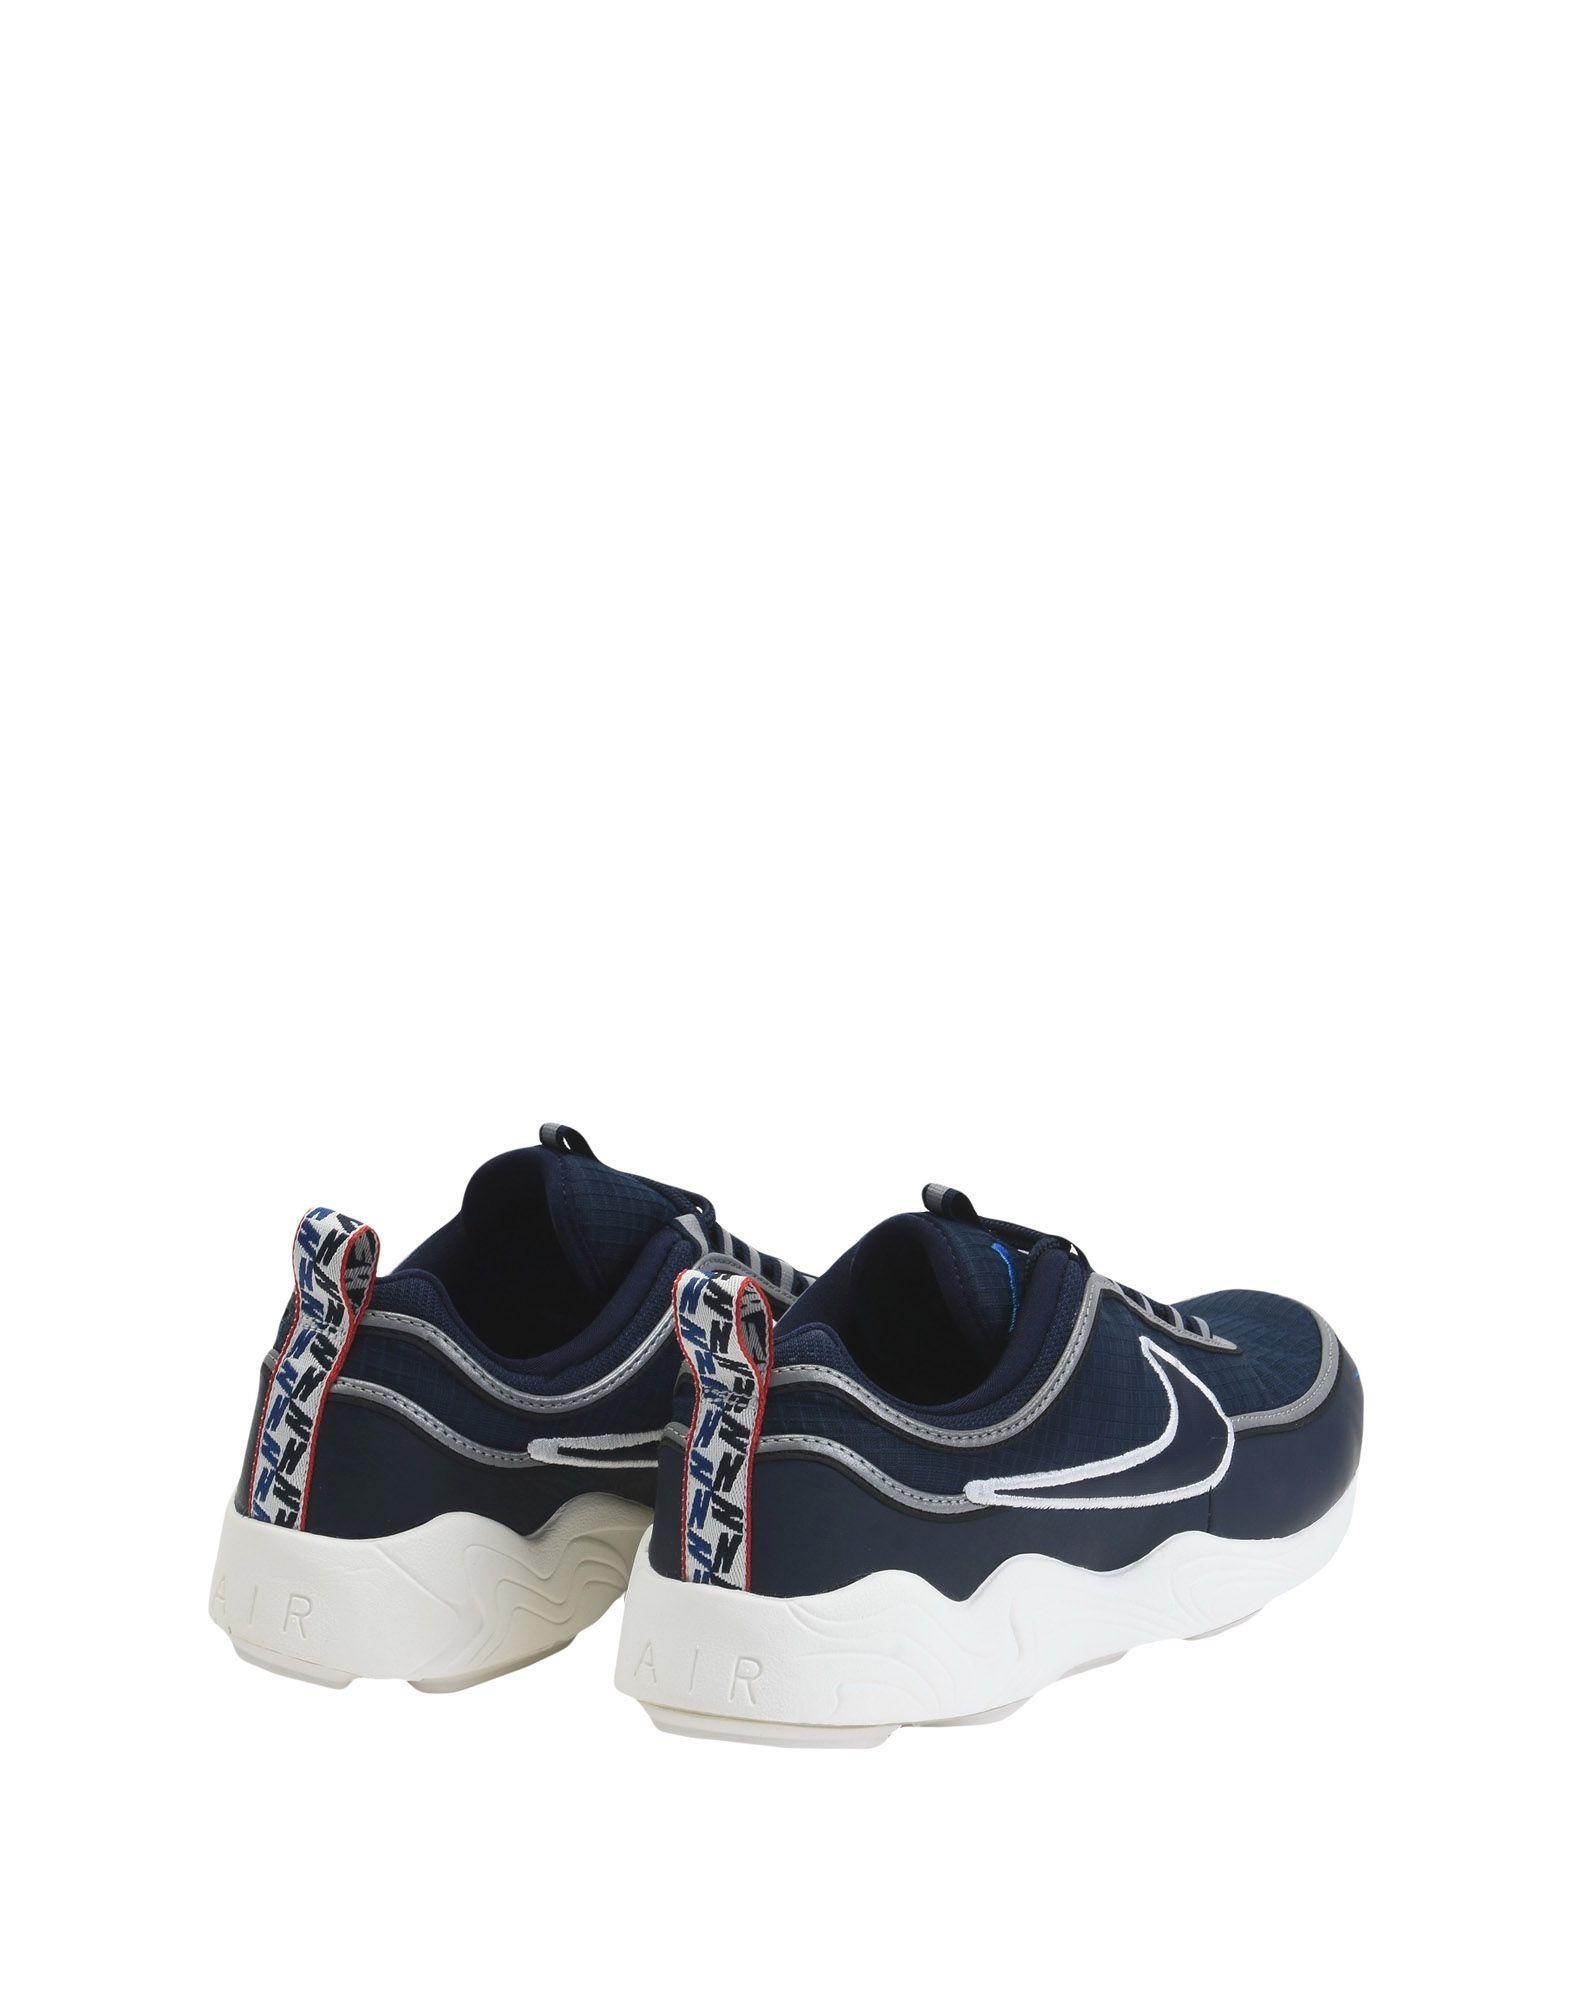 Sneakers Nike Air Zoom Spiridon Bleu Se Homme Bleu Spiridon Sneakers Nike Bleu 049fd3